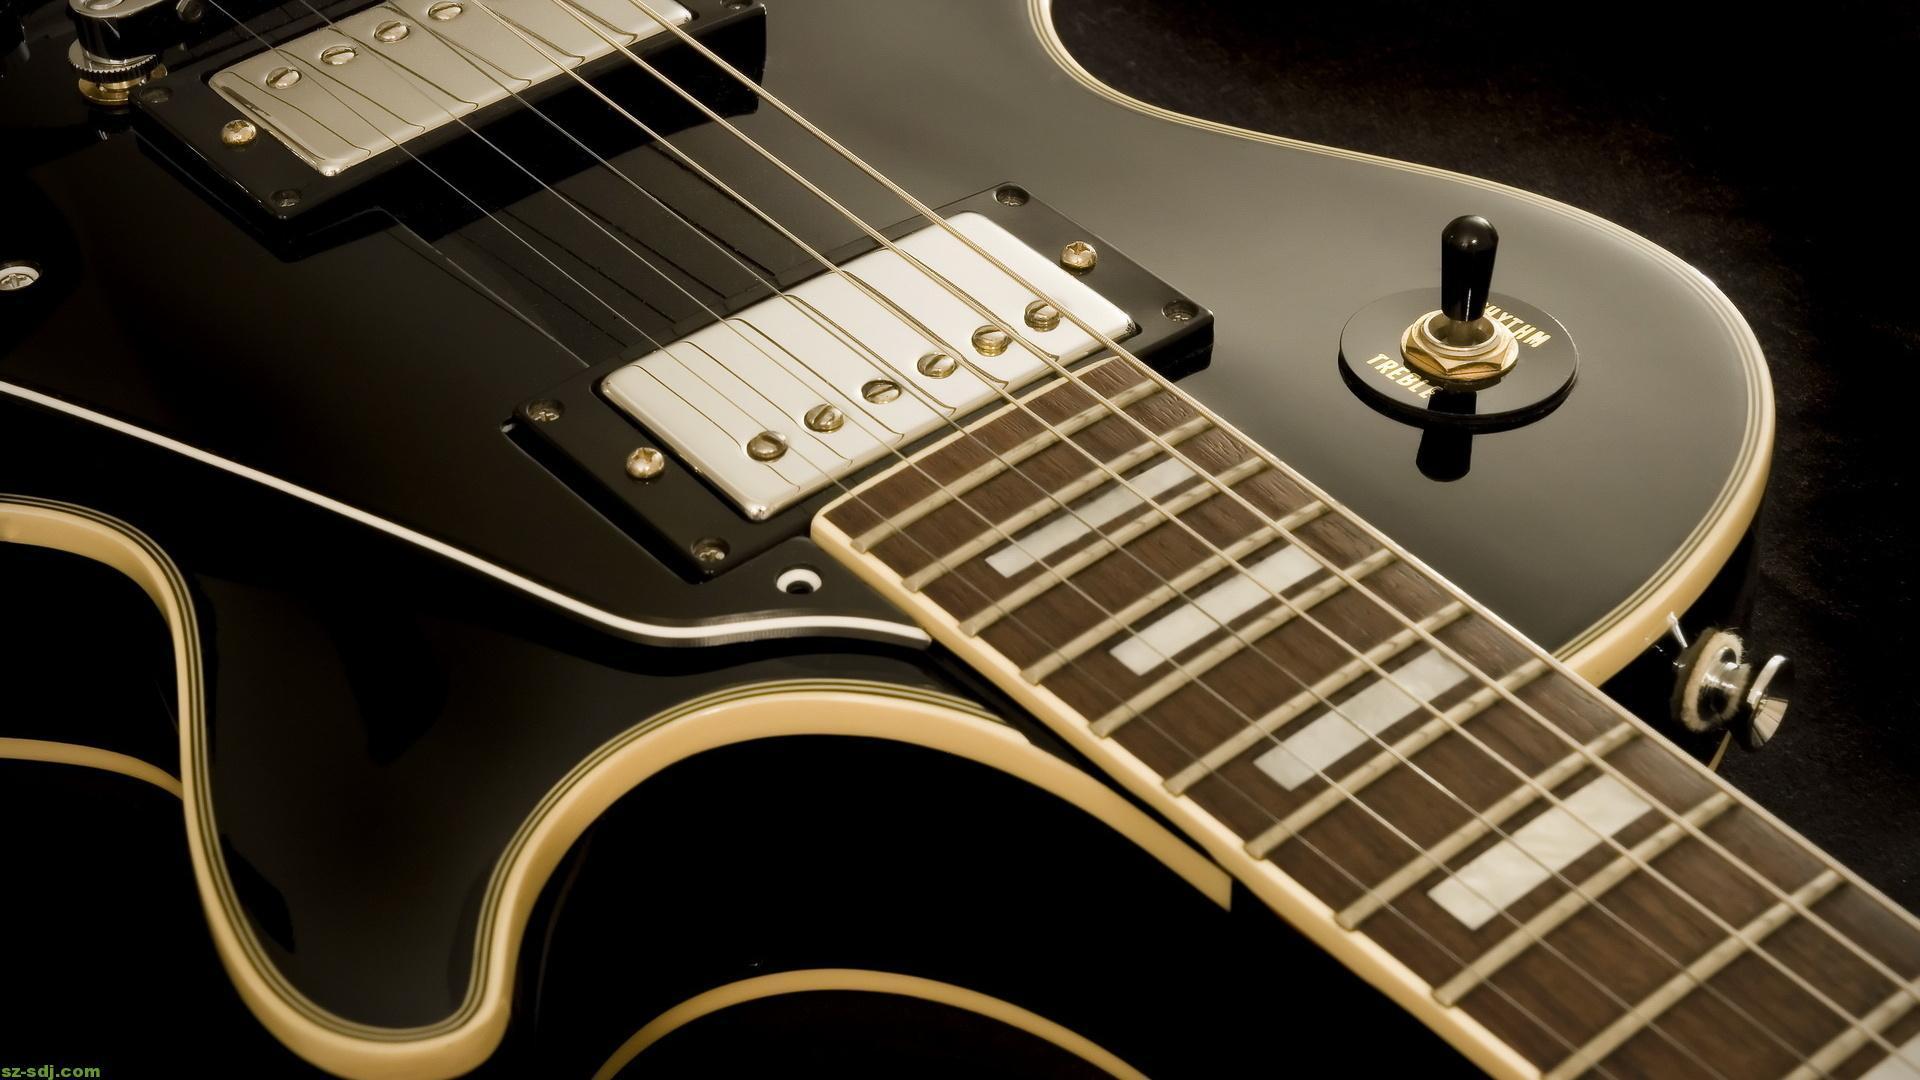 guitar full collor hd - photo #8